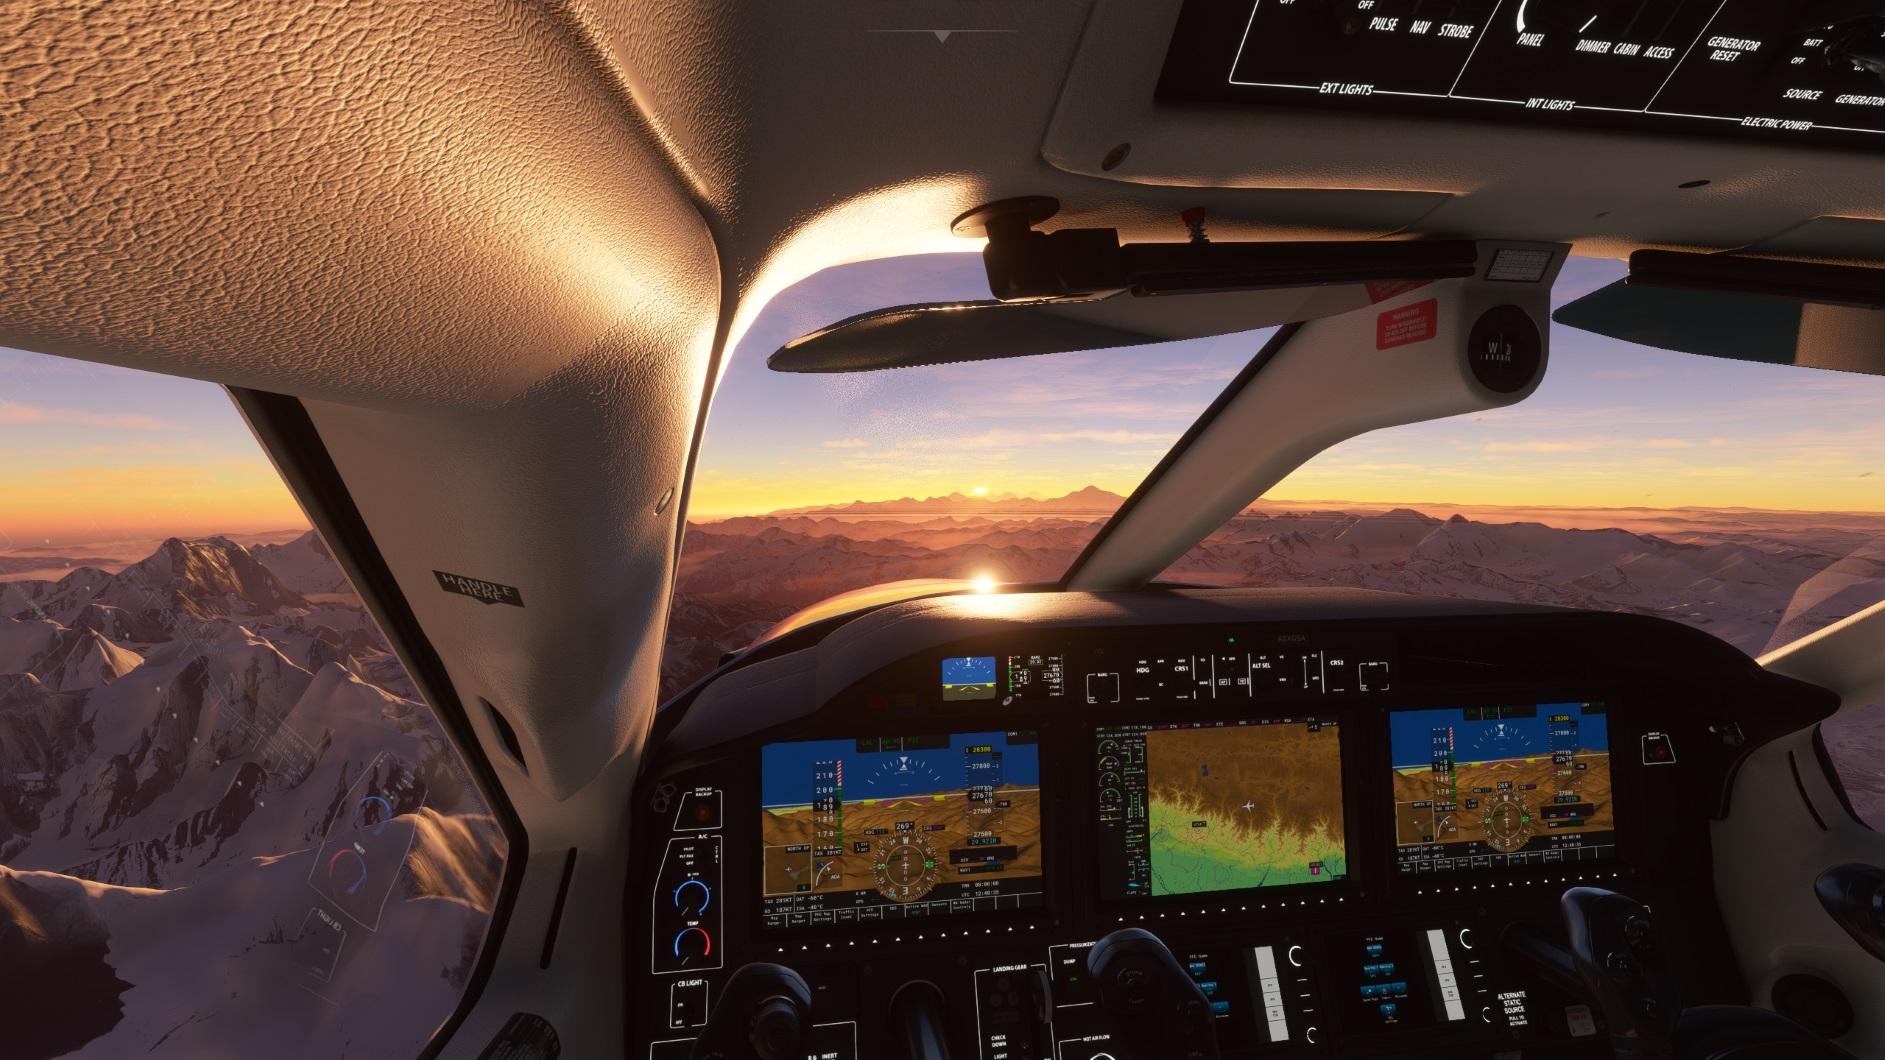 https://i.ibb.co/TwYcf2J/Microsoft-Flight-Simulator-12-04-2021-00-11-15.jpg